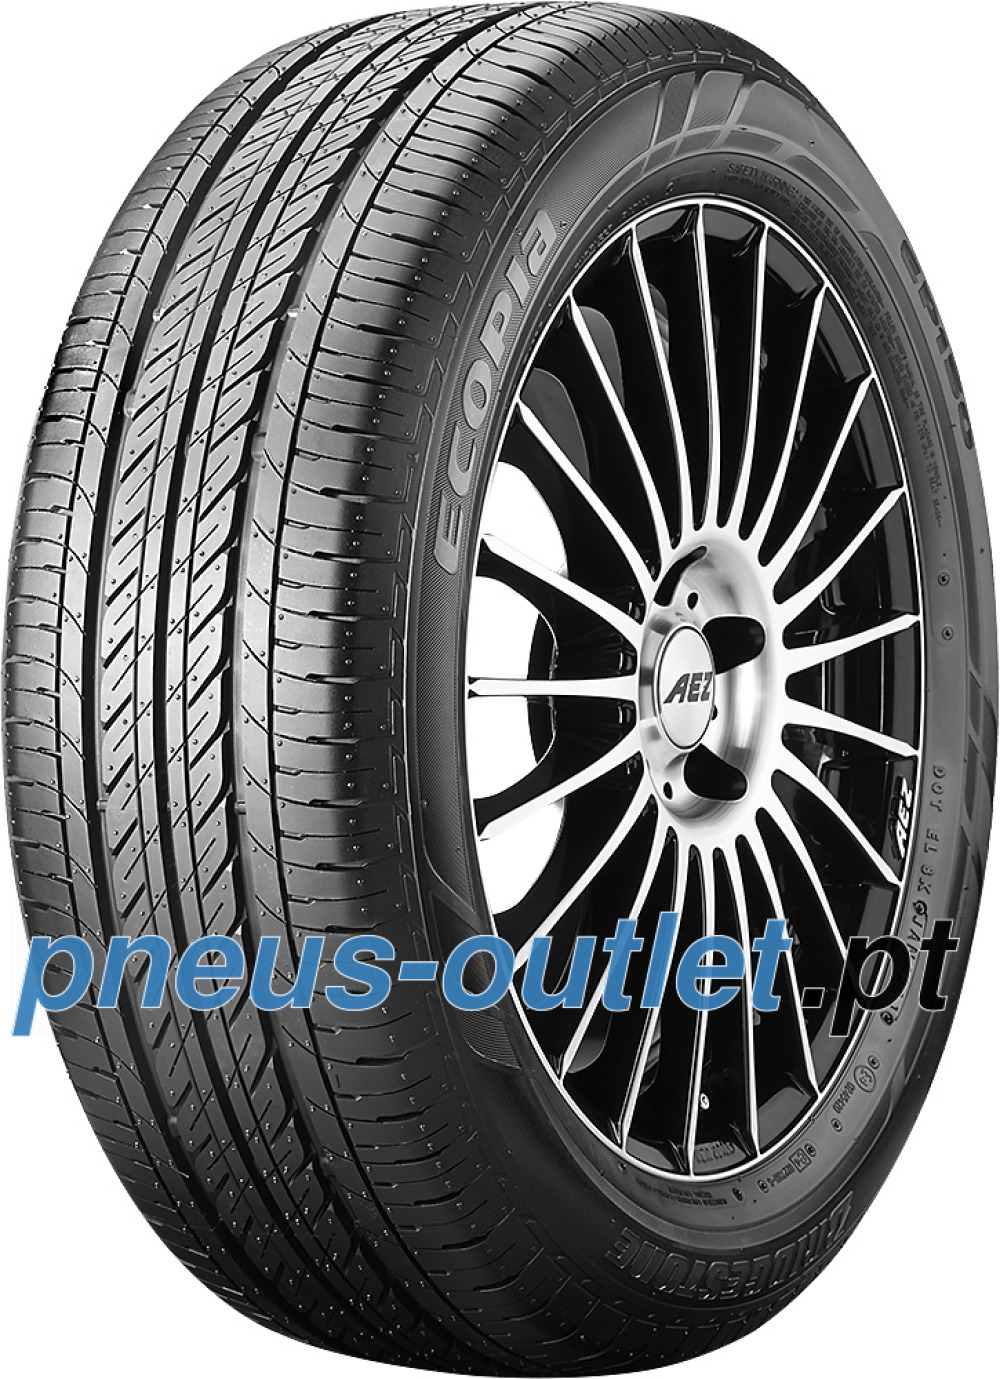 Bridgestone Ecopia EP150 ( 175/65 R14 86T XL )